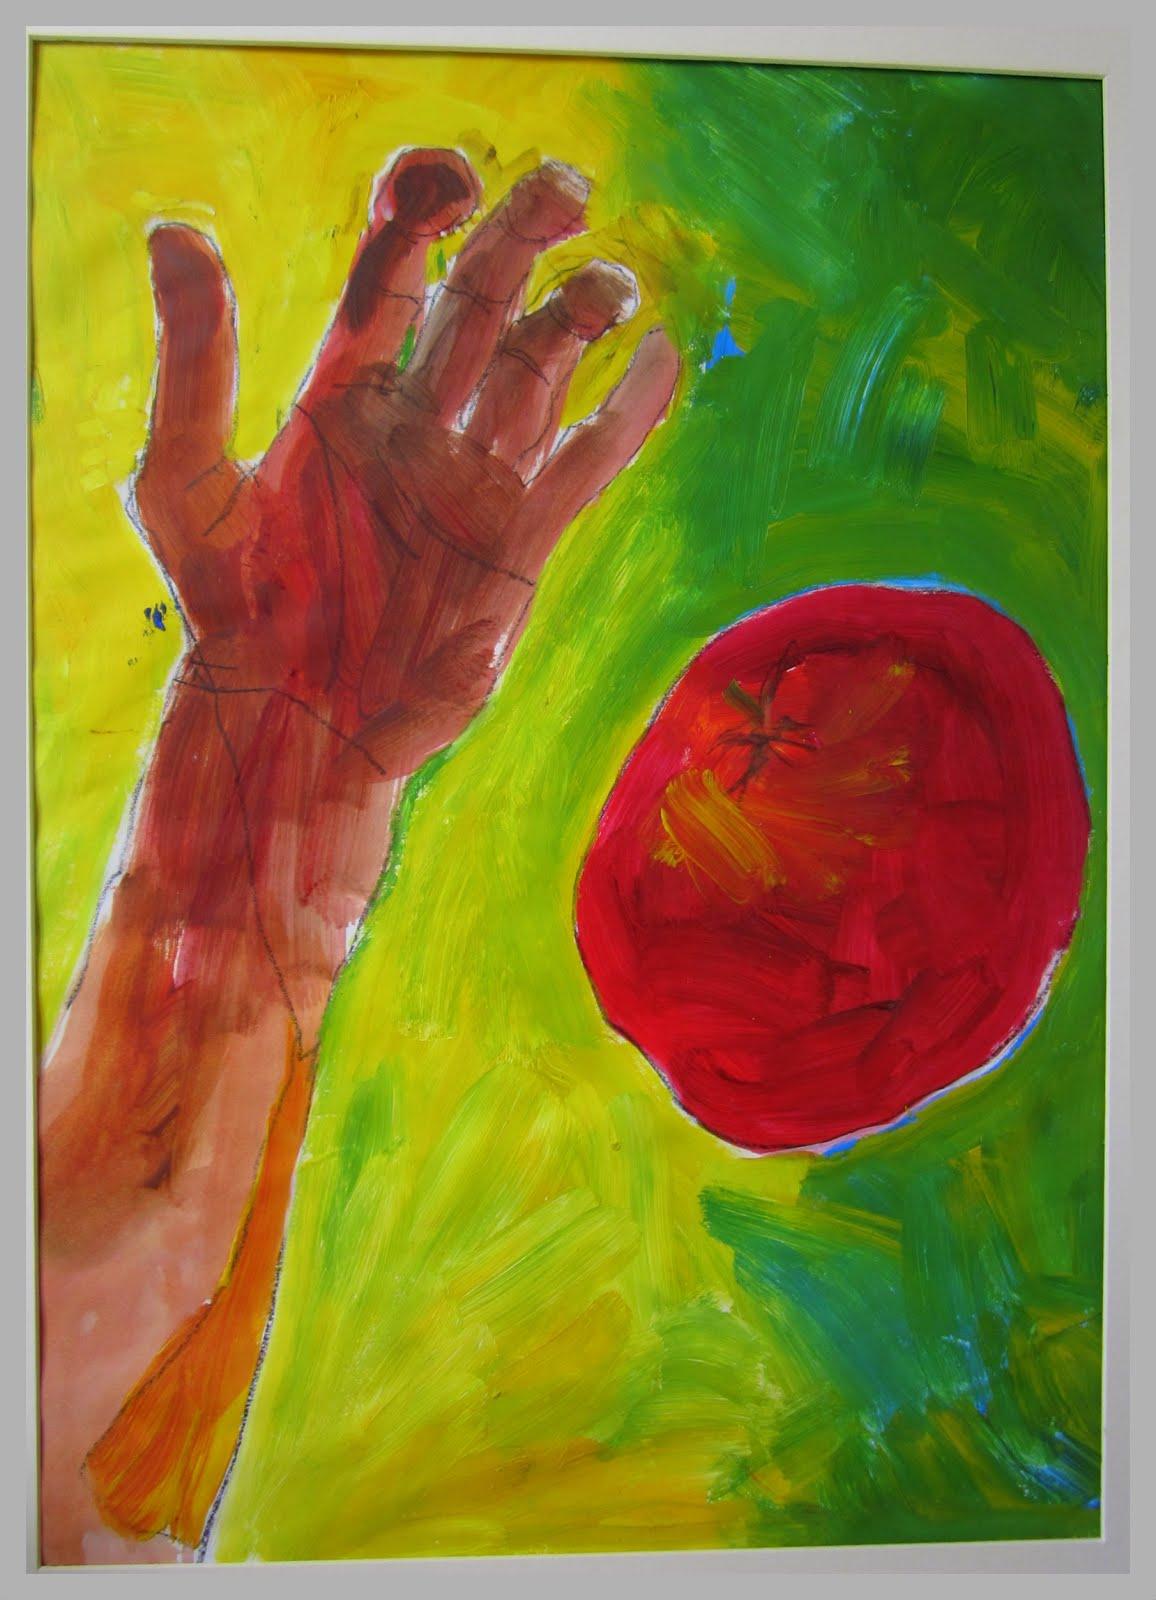 Hand and Tomato